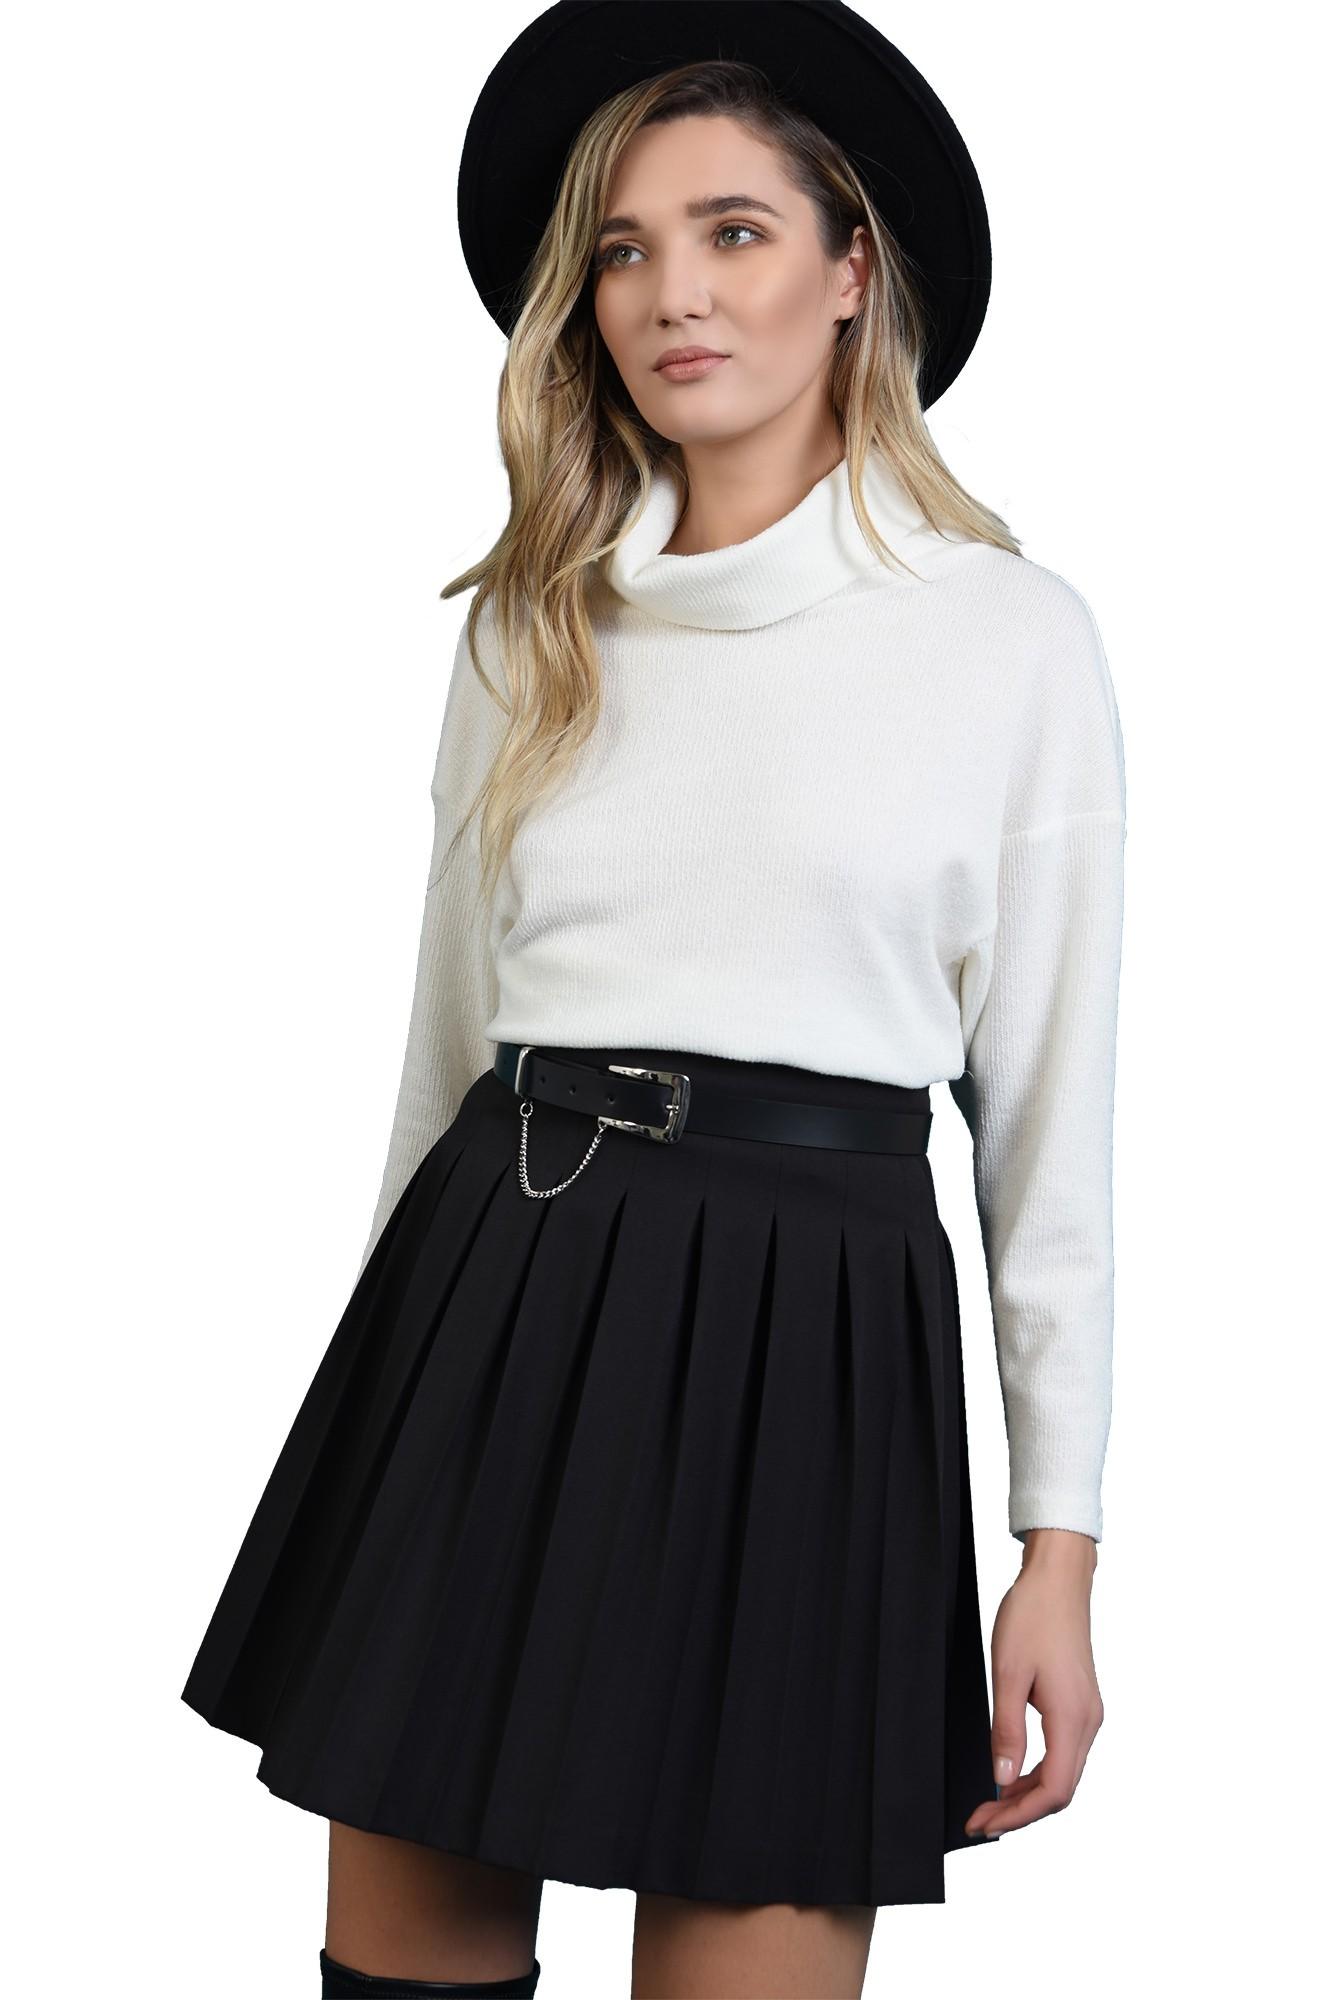 3 - fusta neagra,mini, cu pliuri, cu talie inalta